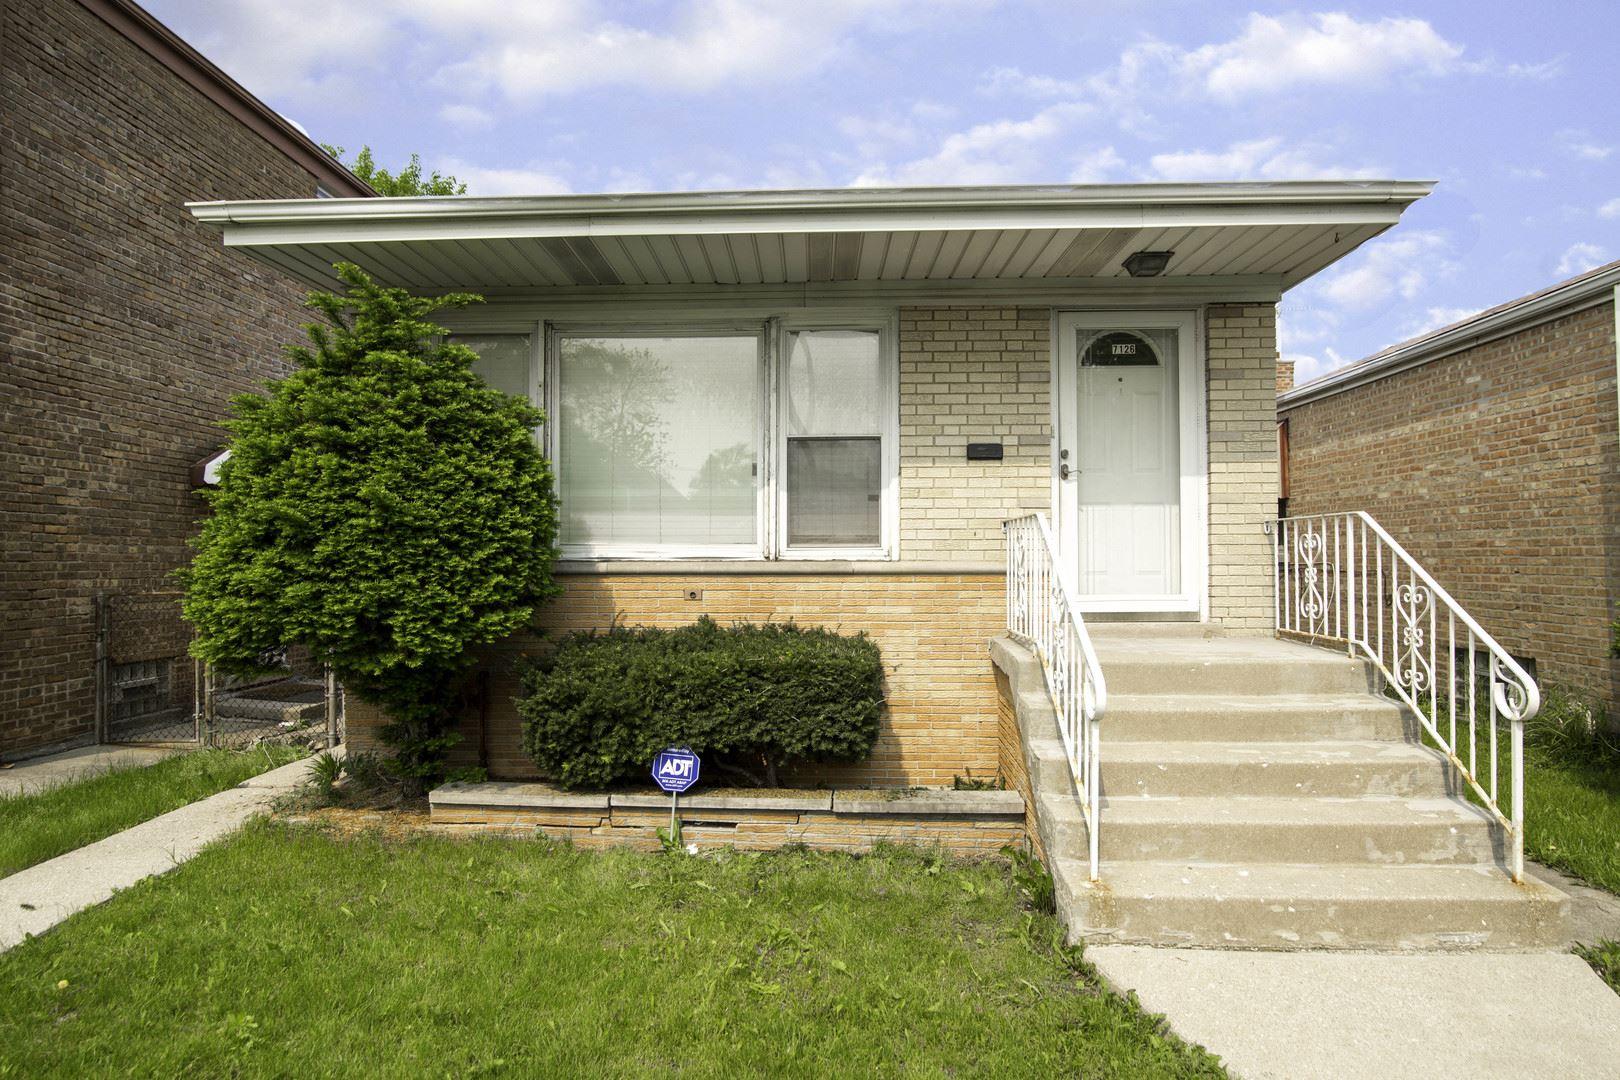 7126 S Kedzie Avenue, Chicago, IL 60629 - #: 10404085